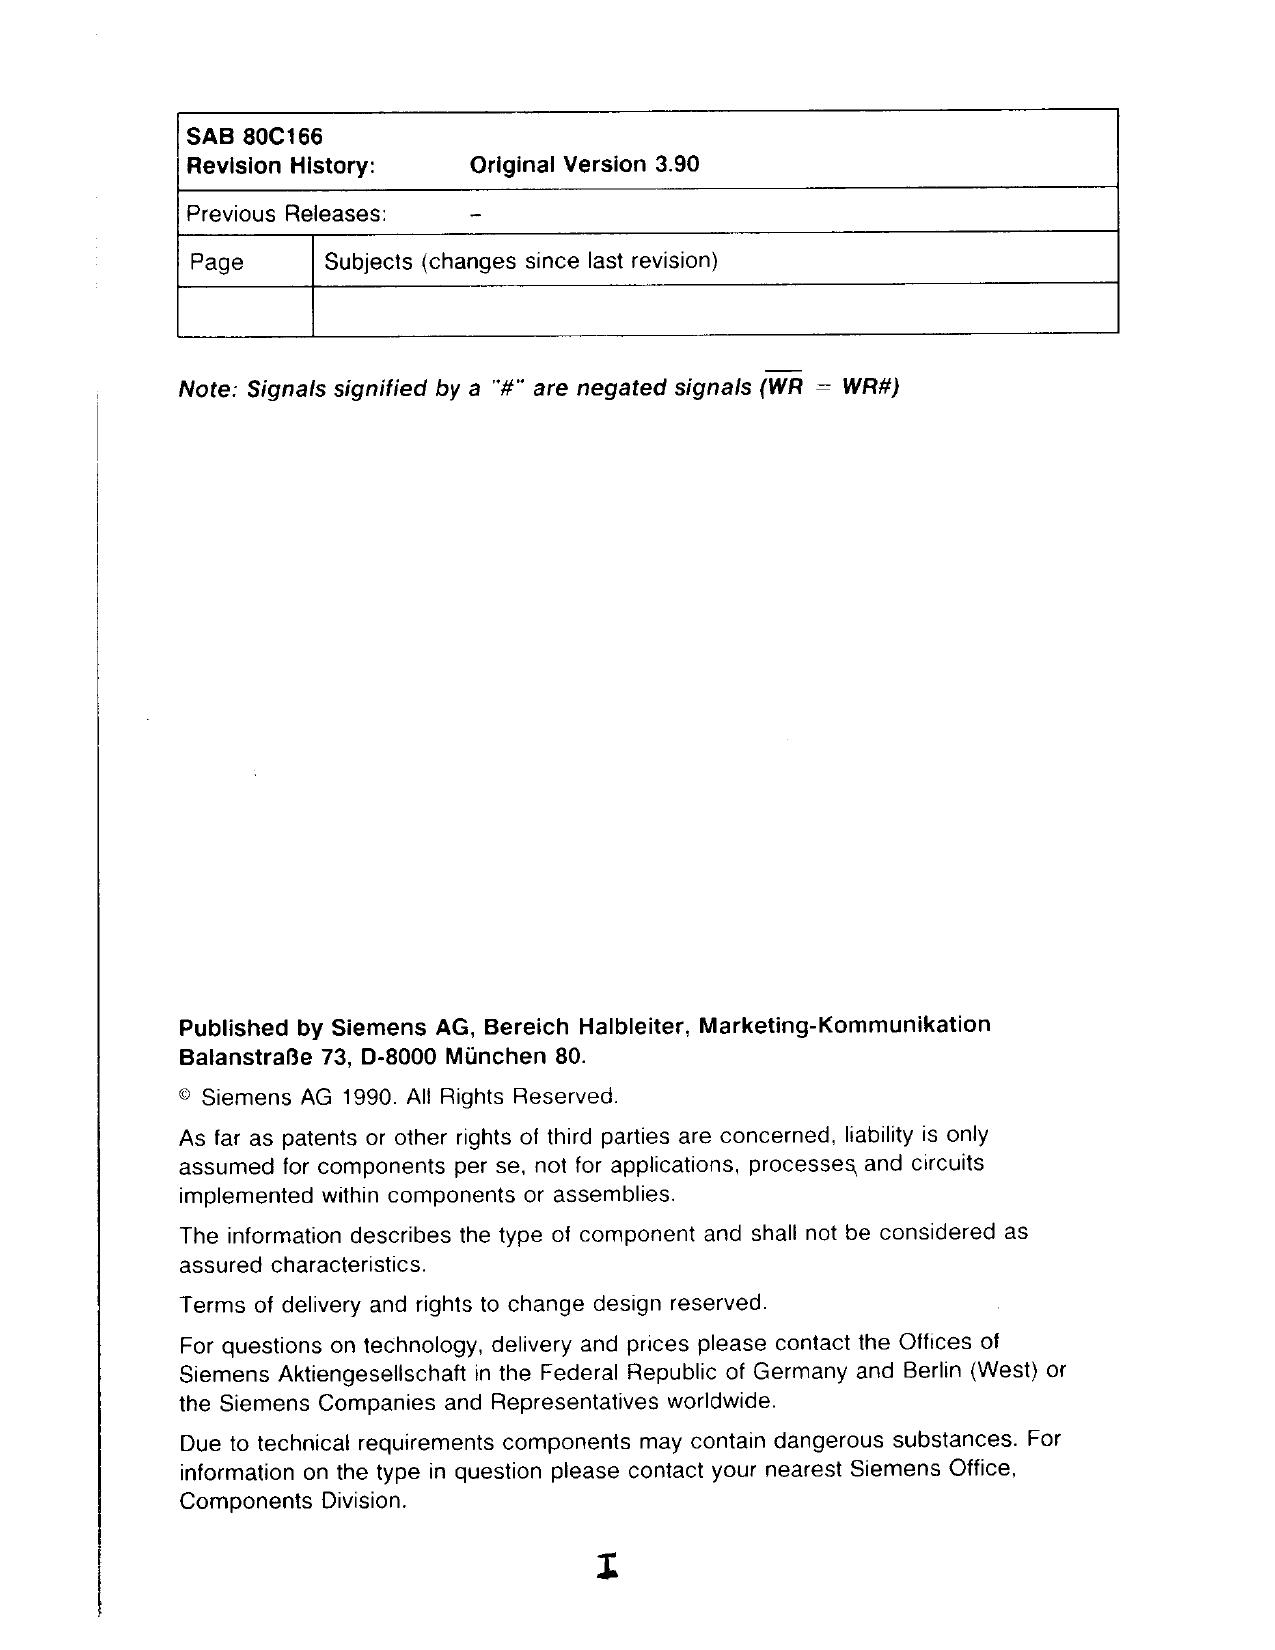 high performance leadership application pdf